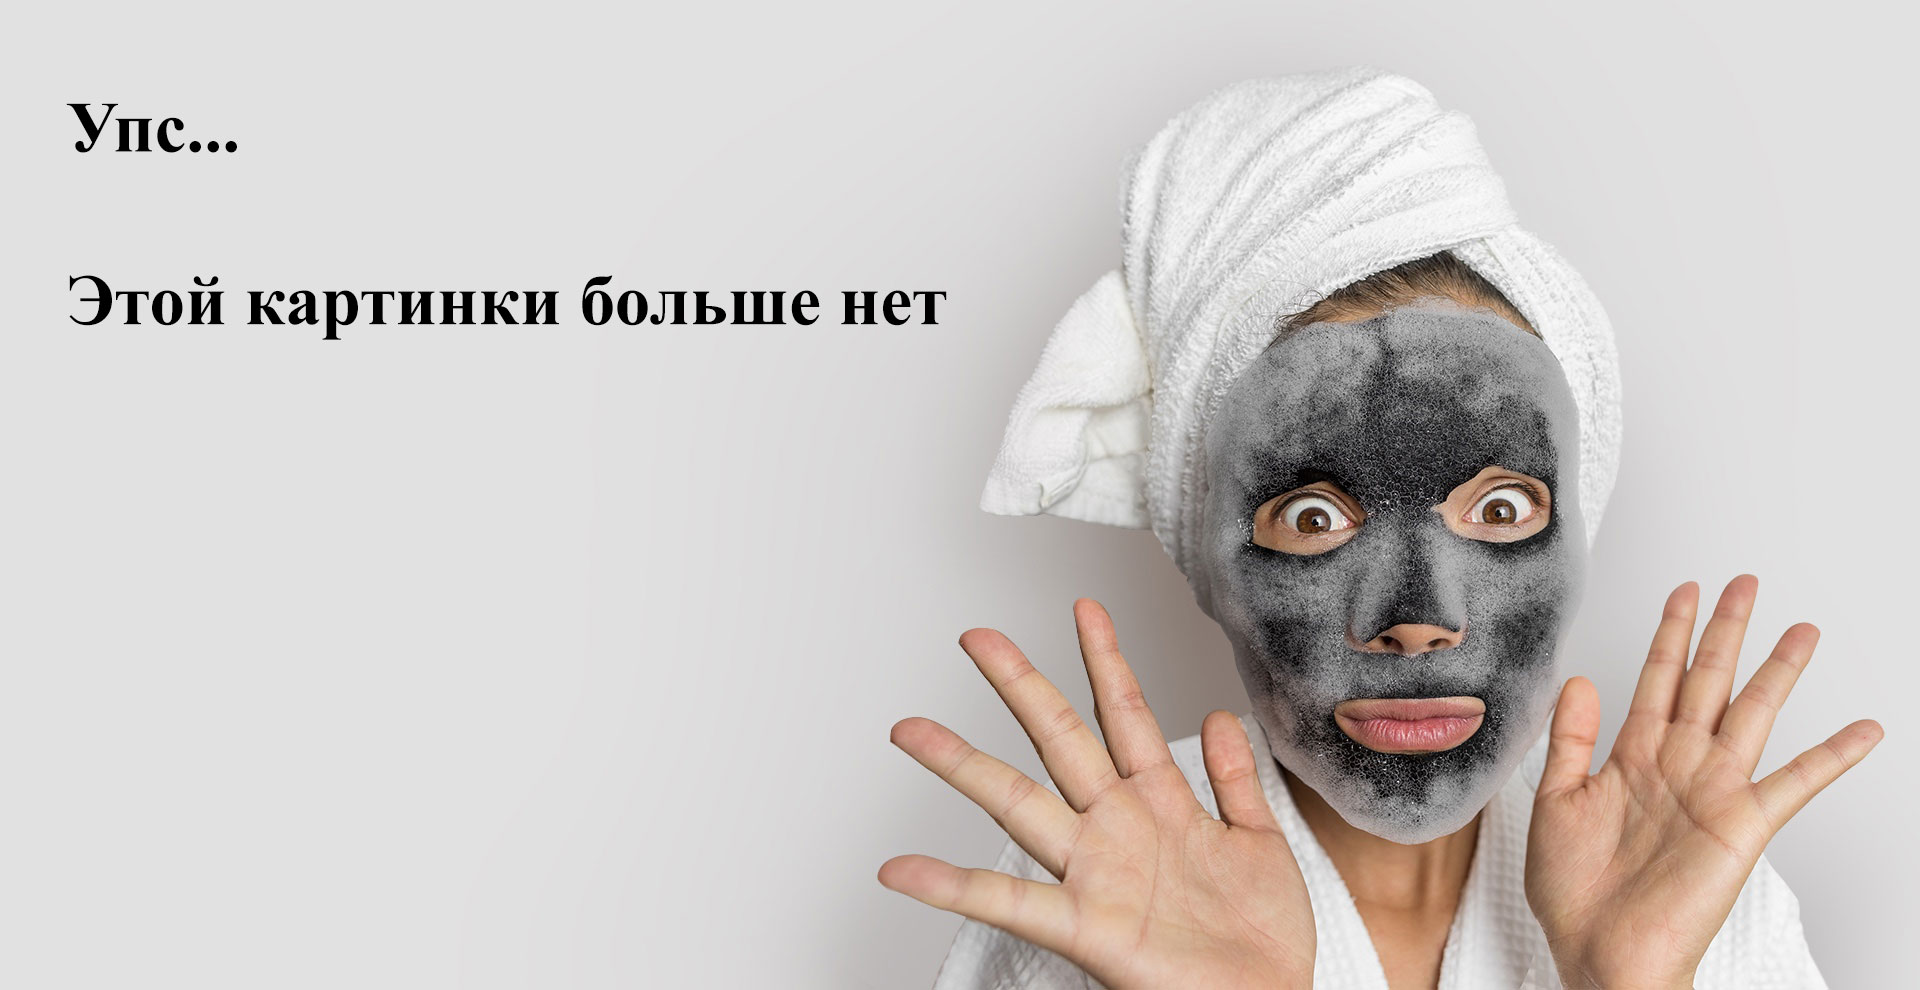 Patrisa Nail, Лезвия для педикюрного станка, 10 шт